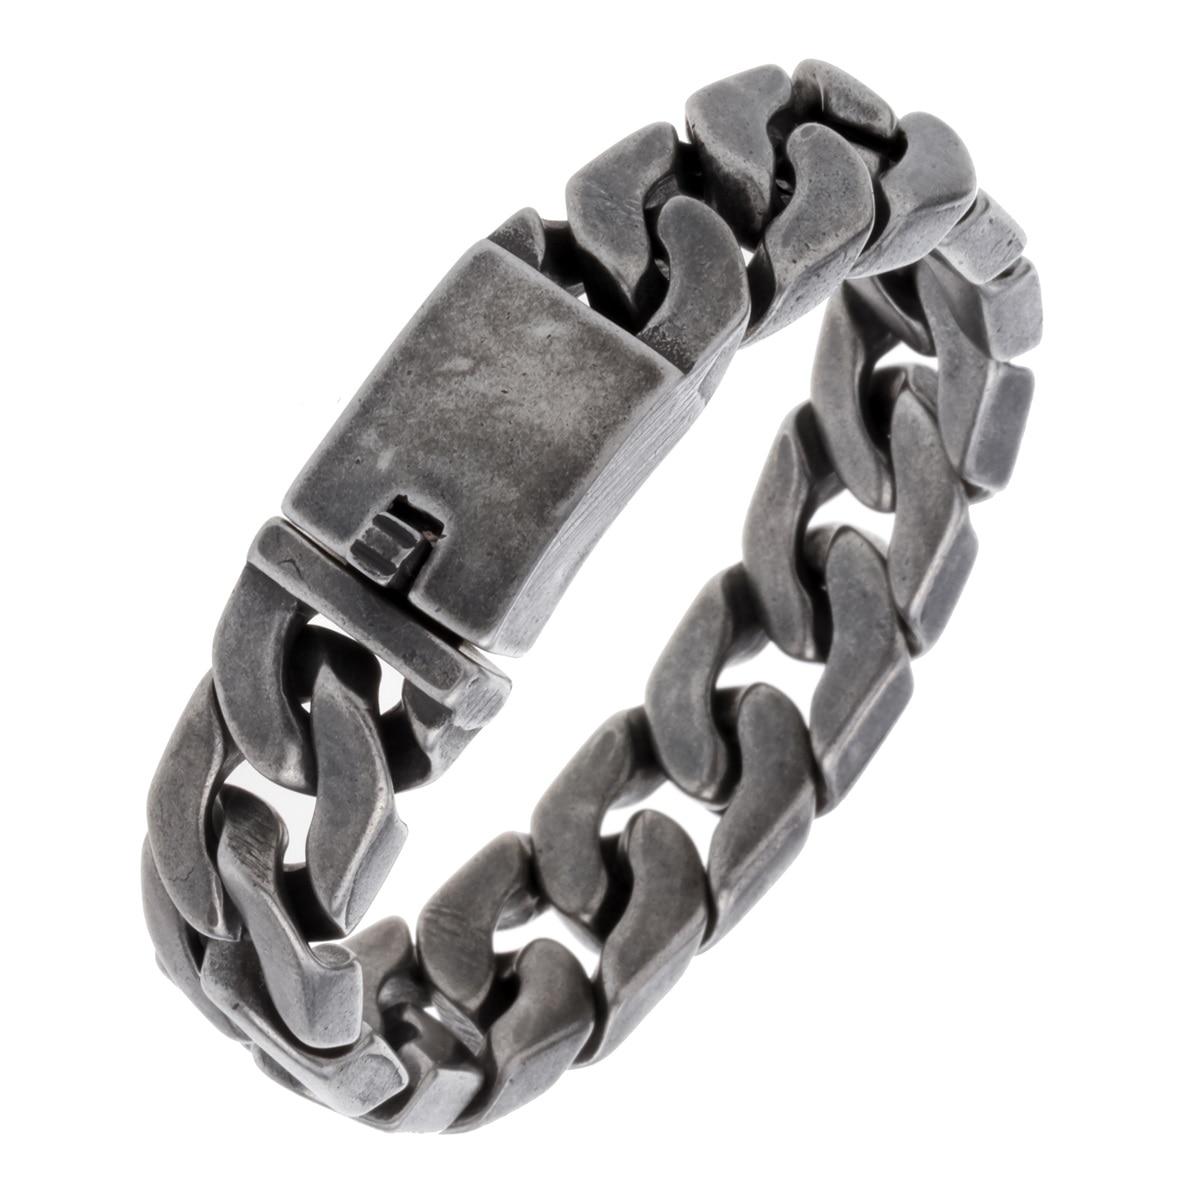 Mens Stainless Steel Link Chain Bracelet Biker Heavy